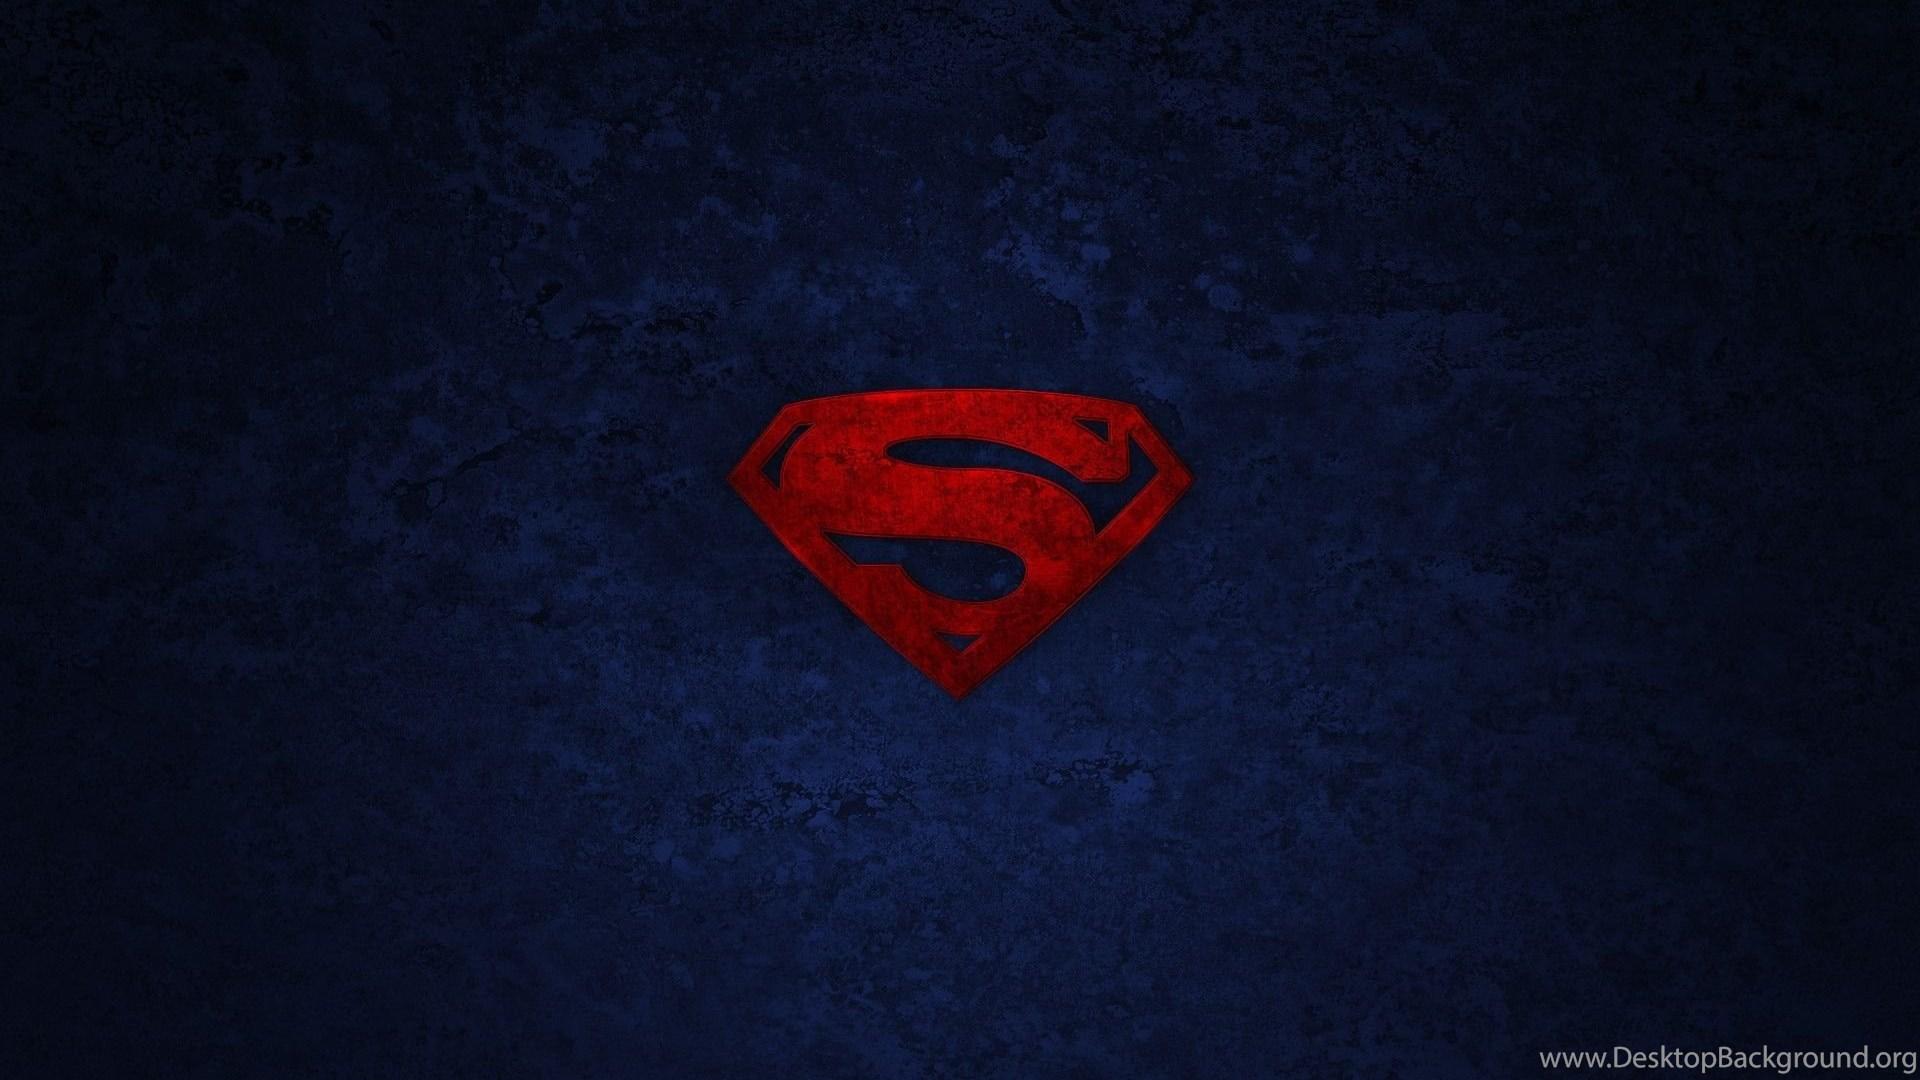 Superman logo wallpaperhero hd wallpapercomics hd wallpapers popular voltagebd Gallery